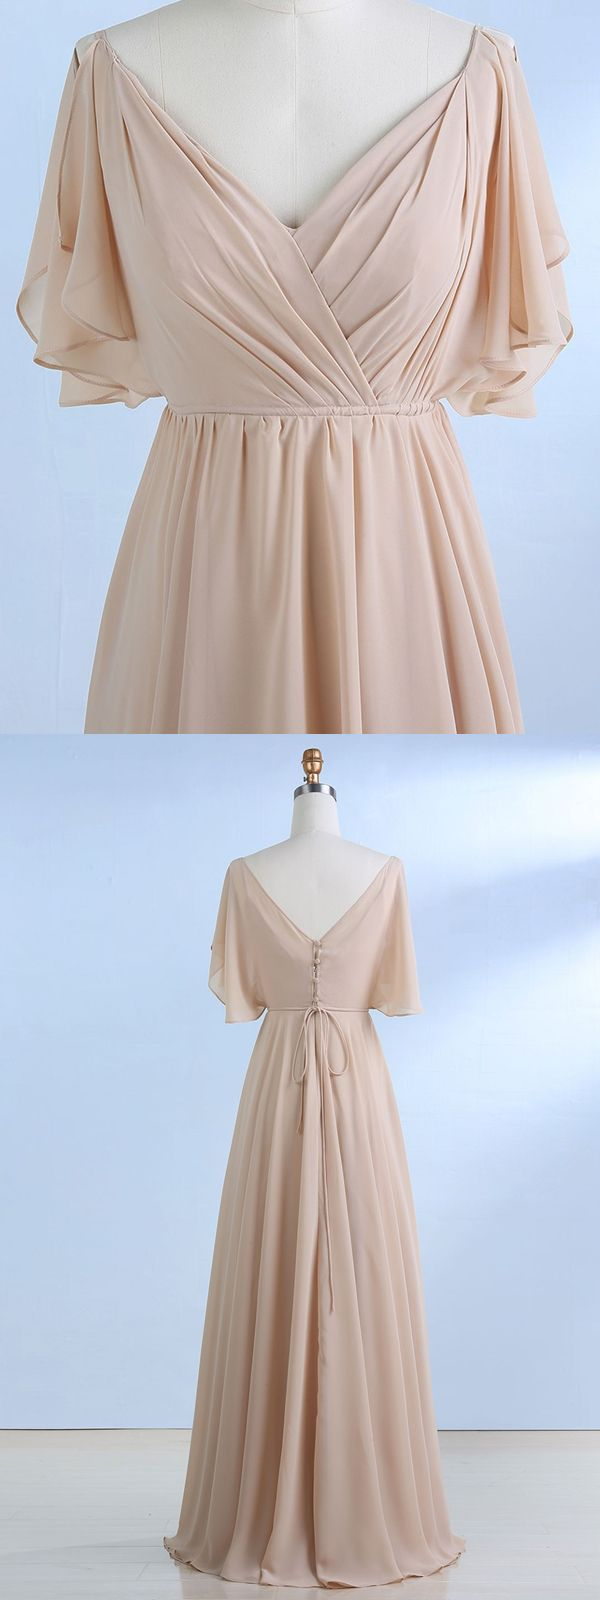 Peach colored prom dresses under 100